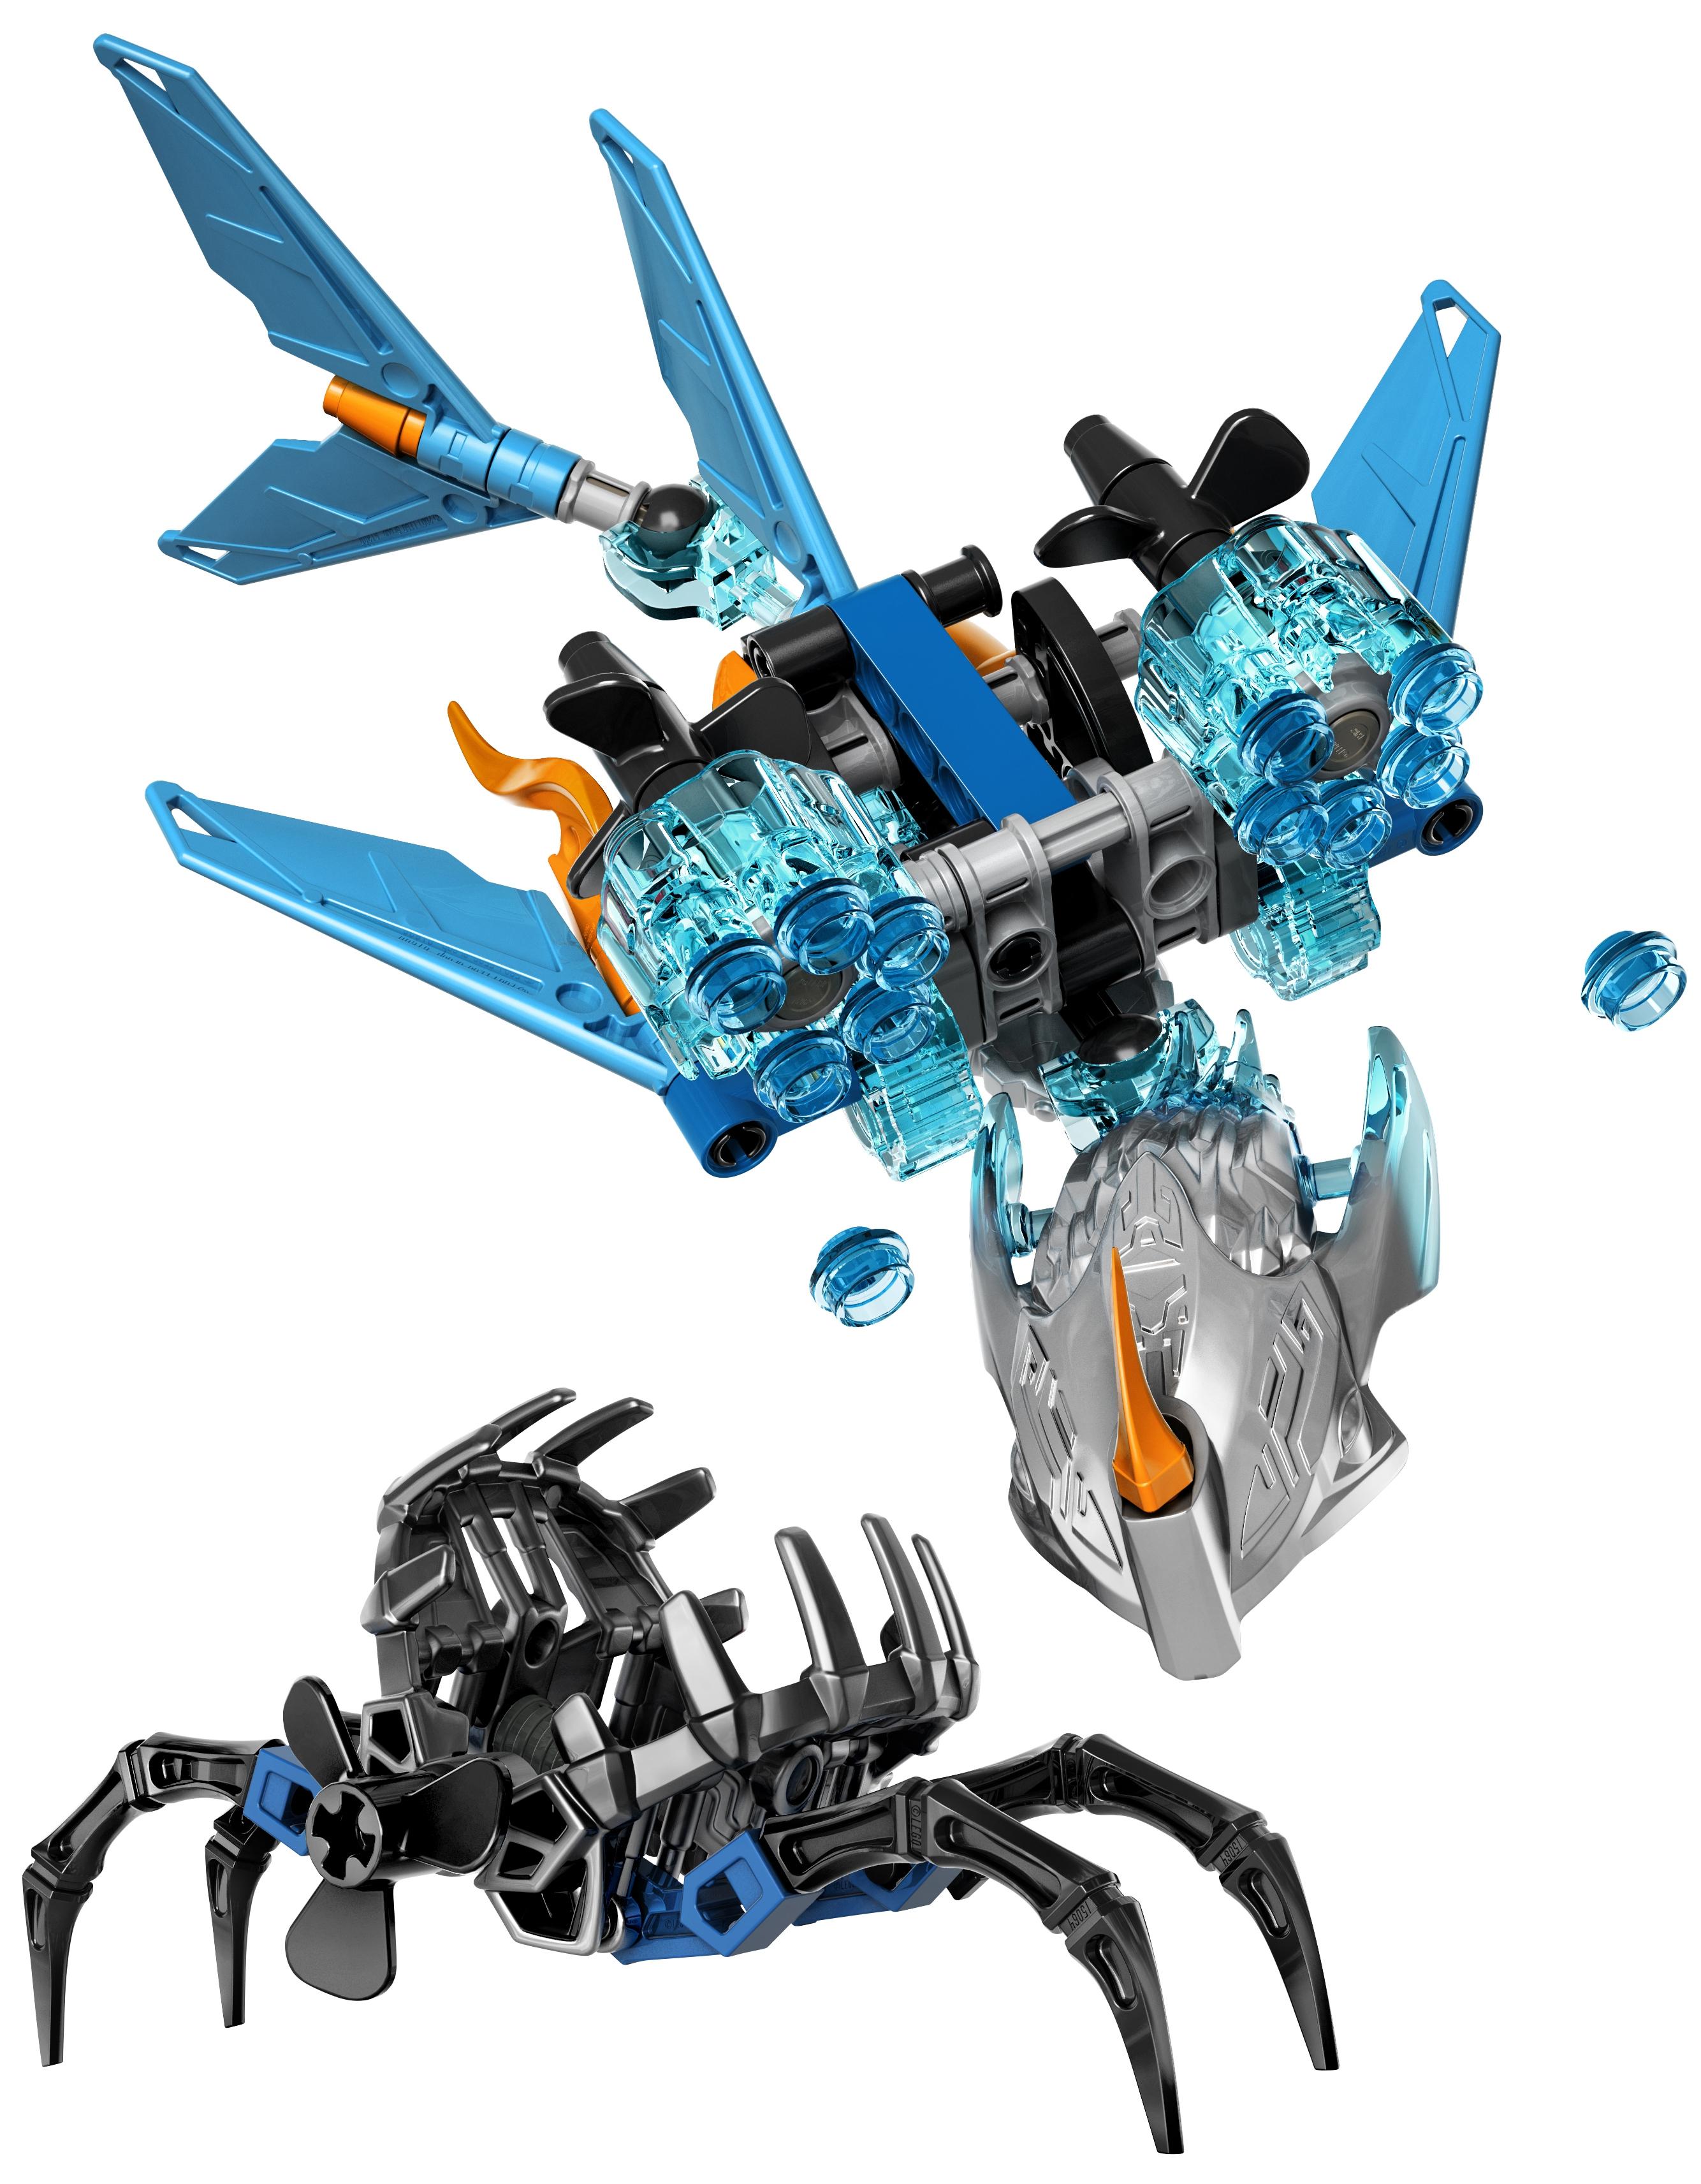 LEGO LEGO Bionicle 71302 Акида - Тотемное животное Воды doyle a doyle the return sherlock holmes